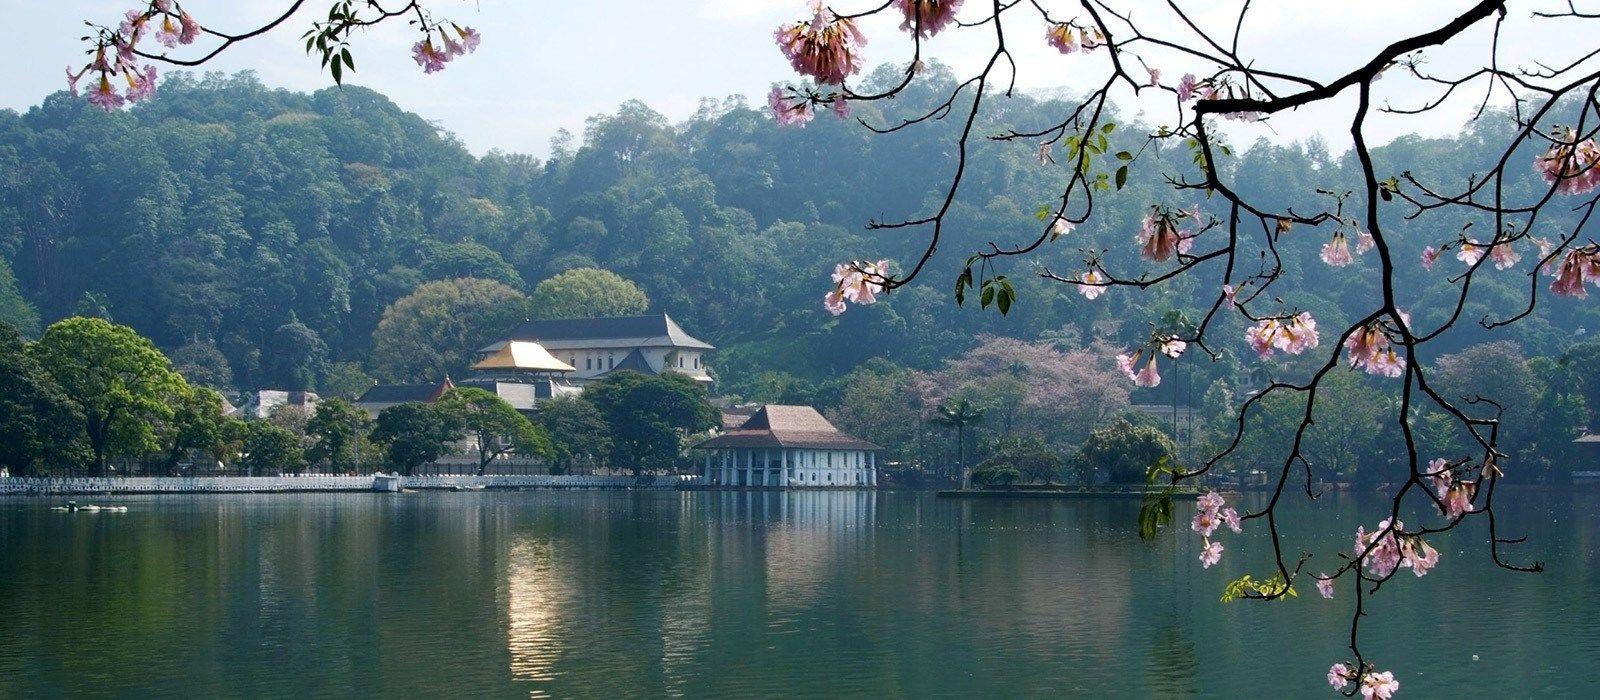 Simply Sri Lanka: Temples and Tea Tour Trip 5